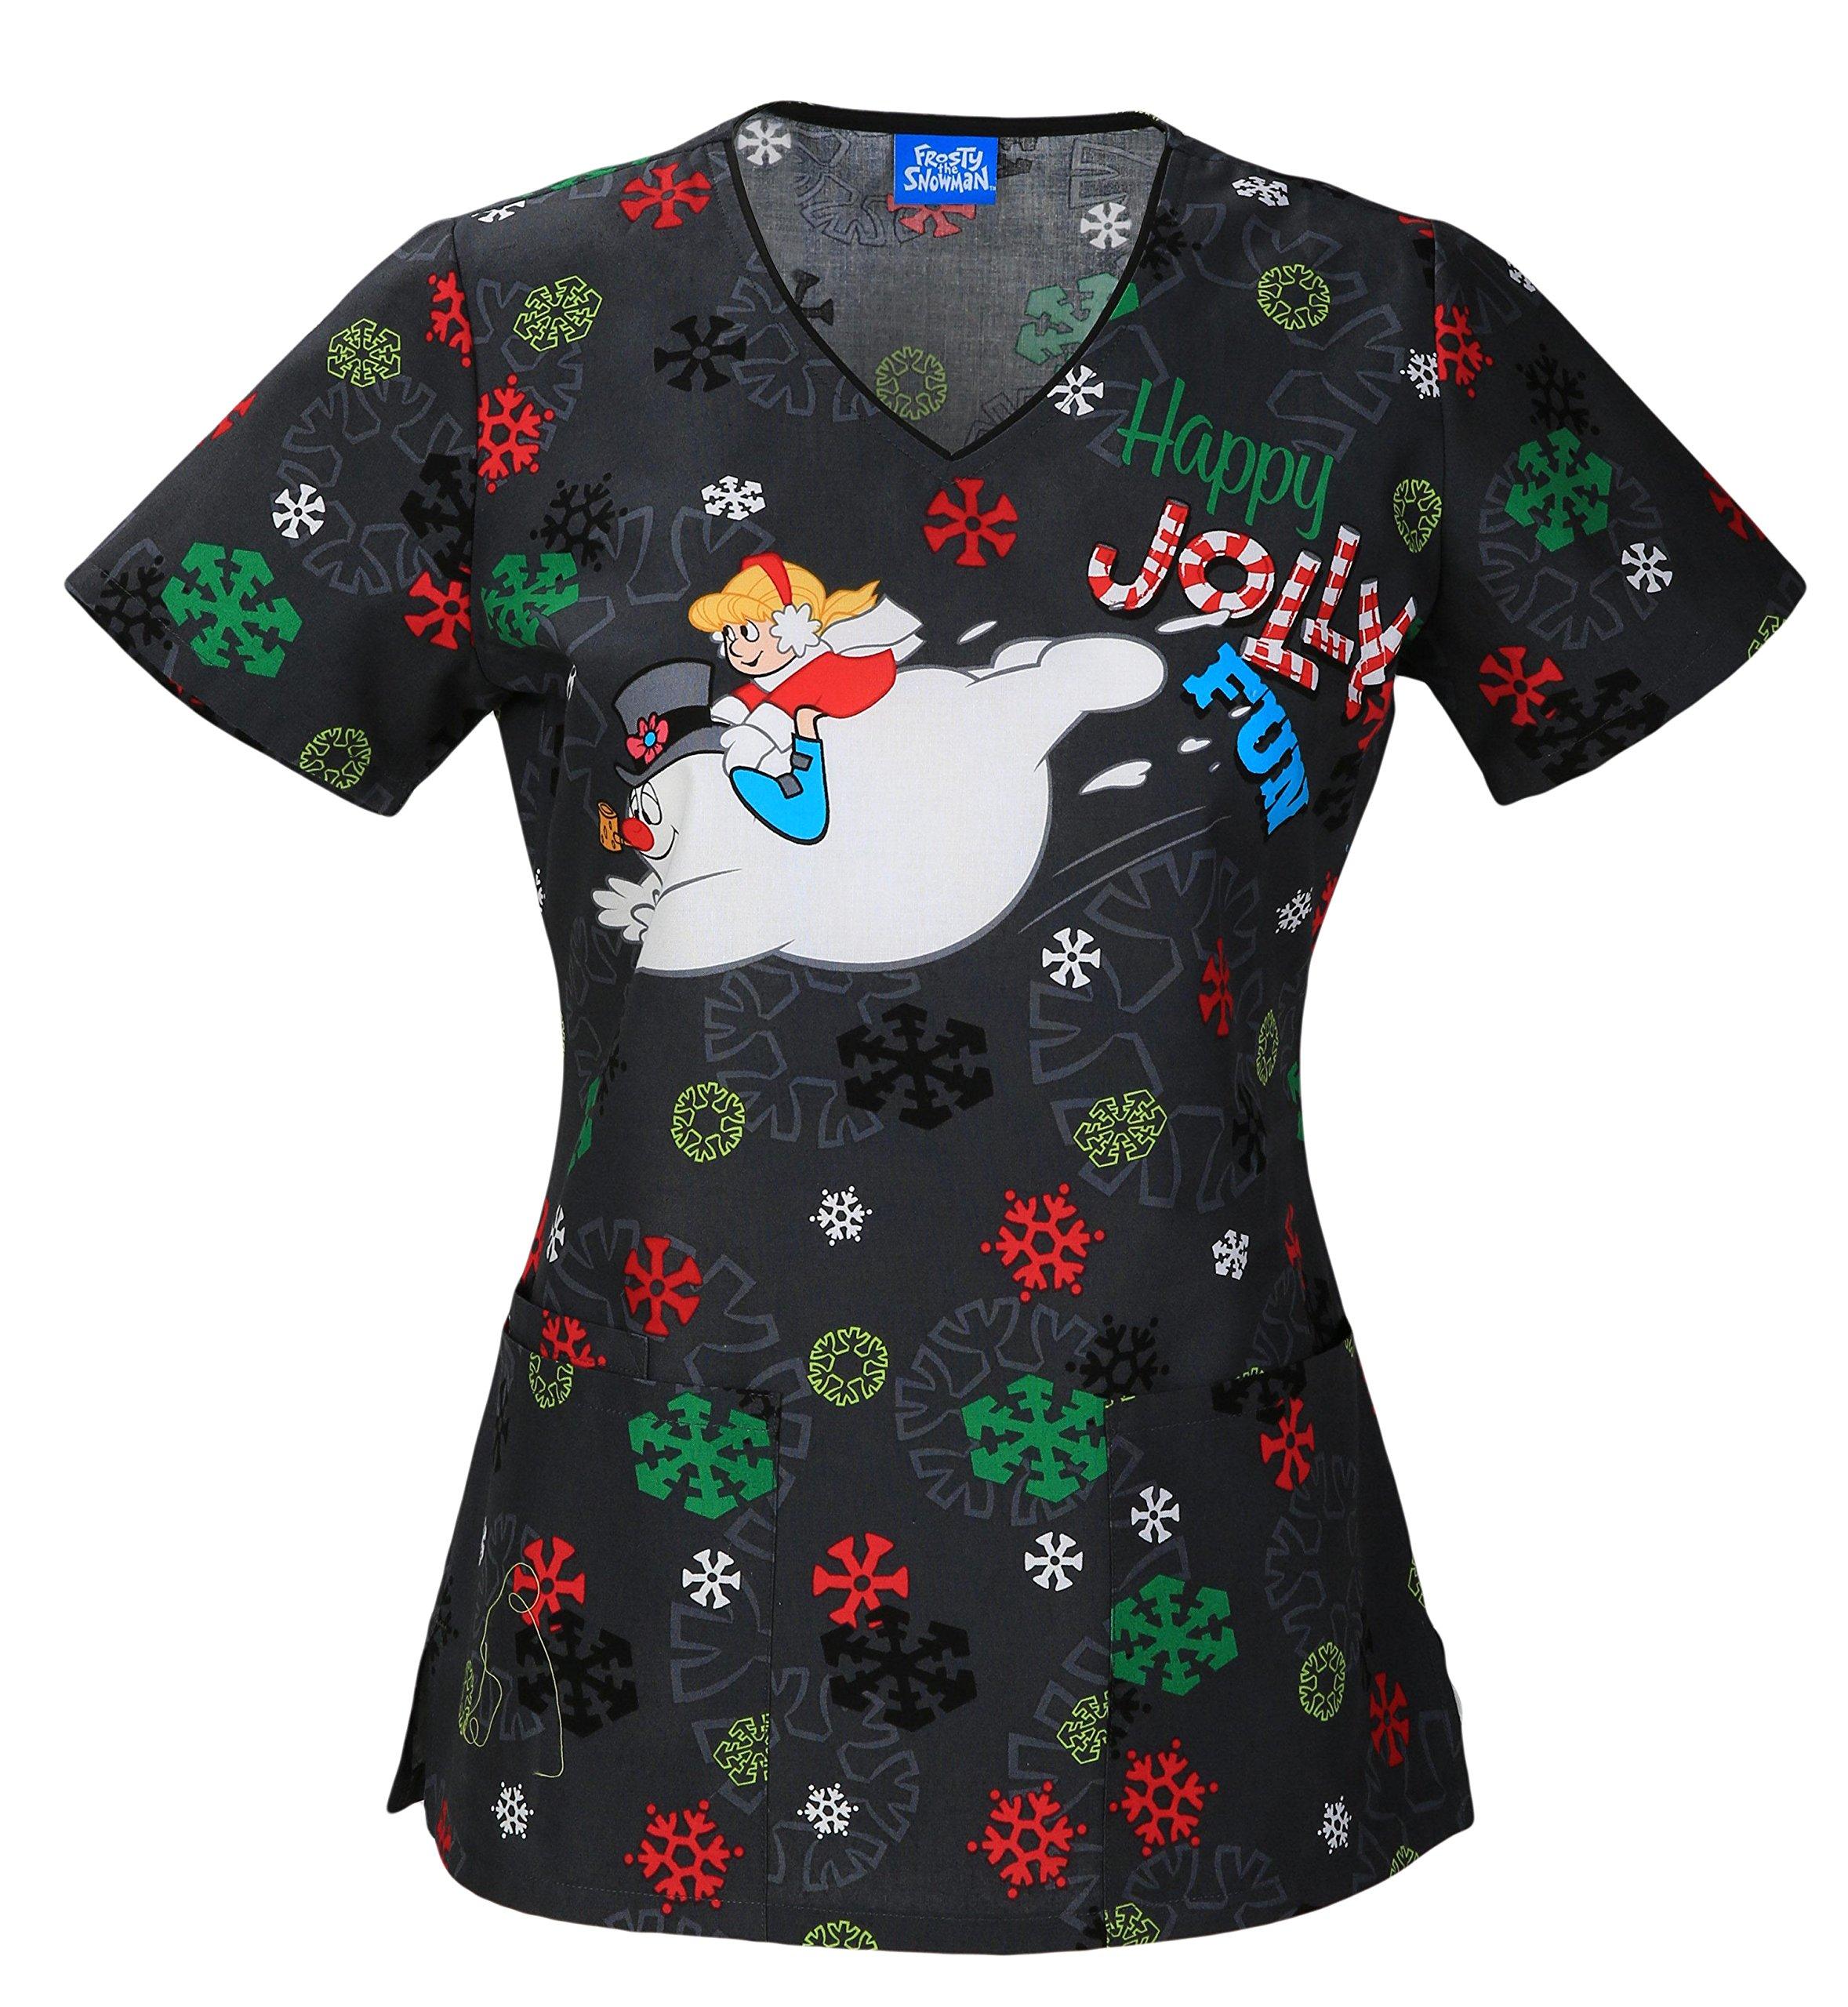 Tooniforms V-Neck Top | Jolly Frosty Fun Size XL